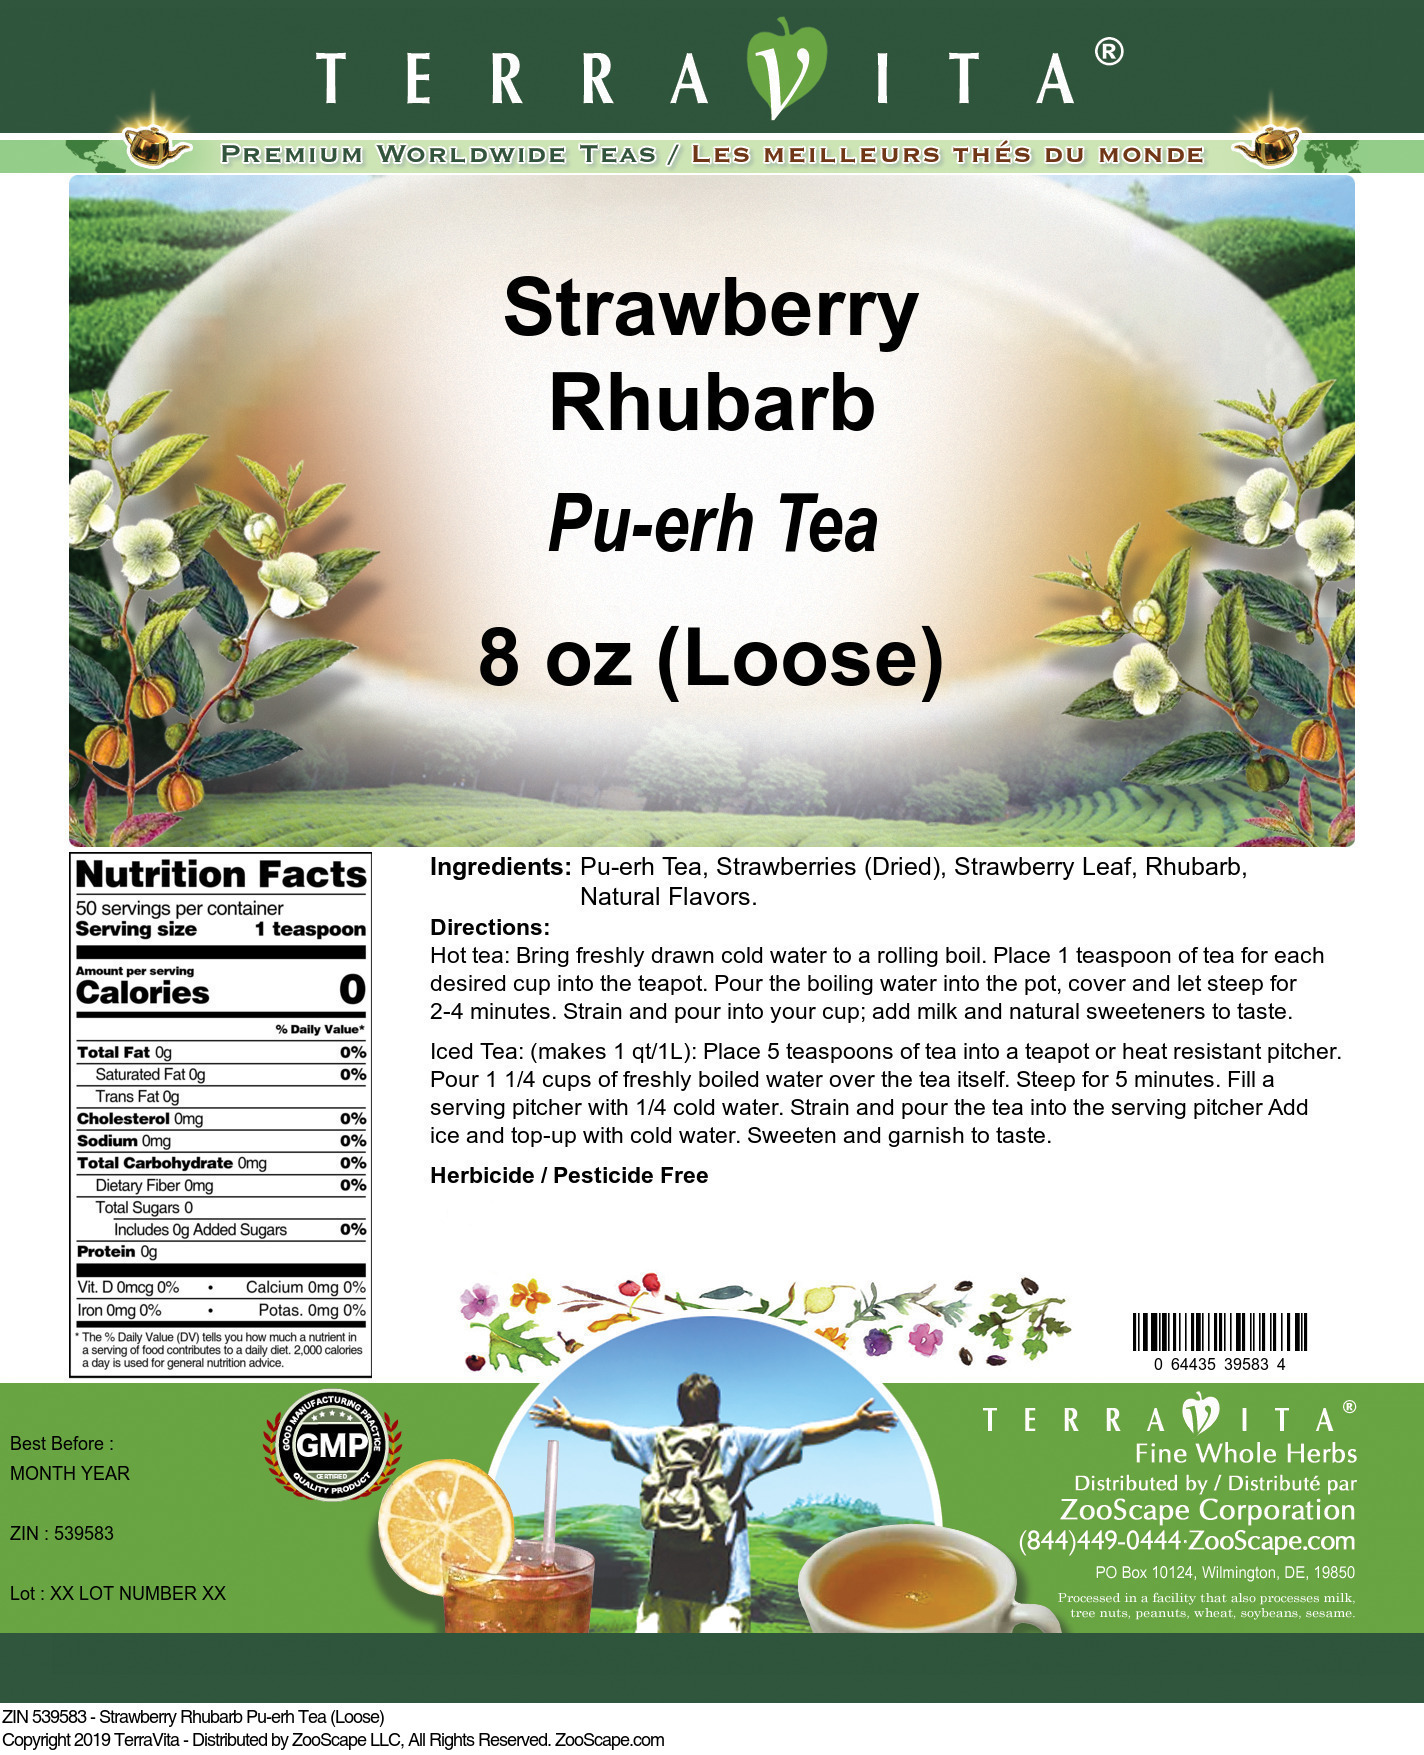 Strawberry Rhubarb Pu-erh Tea